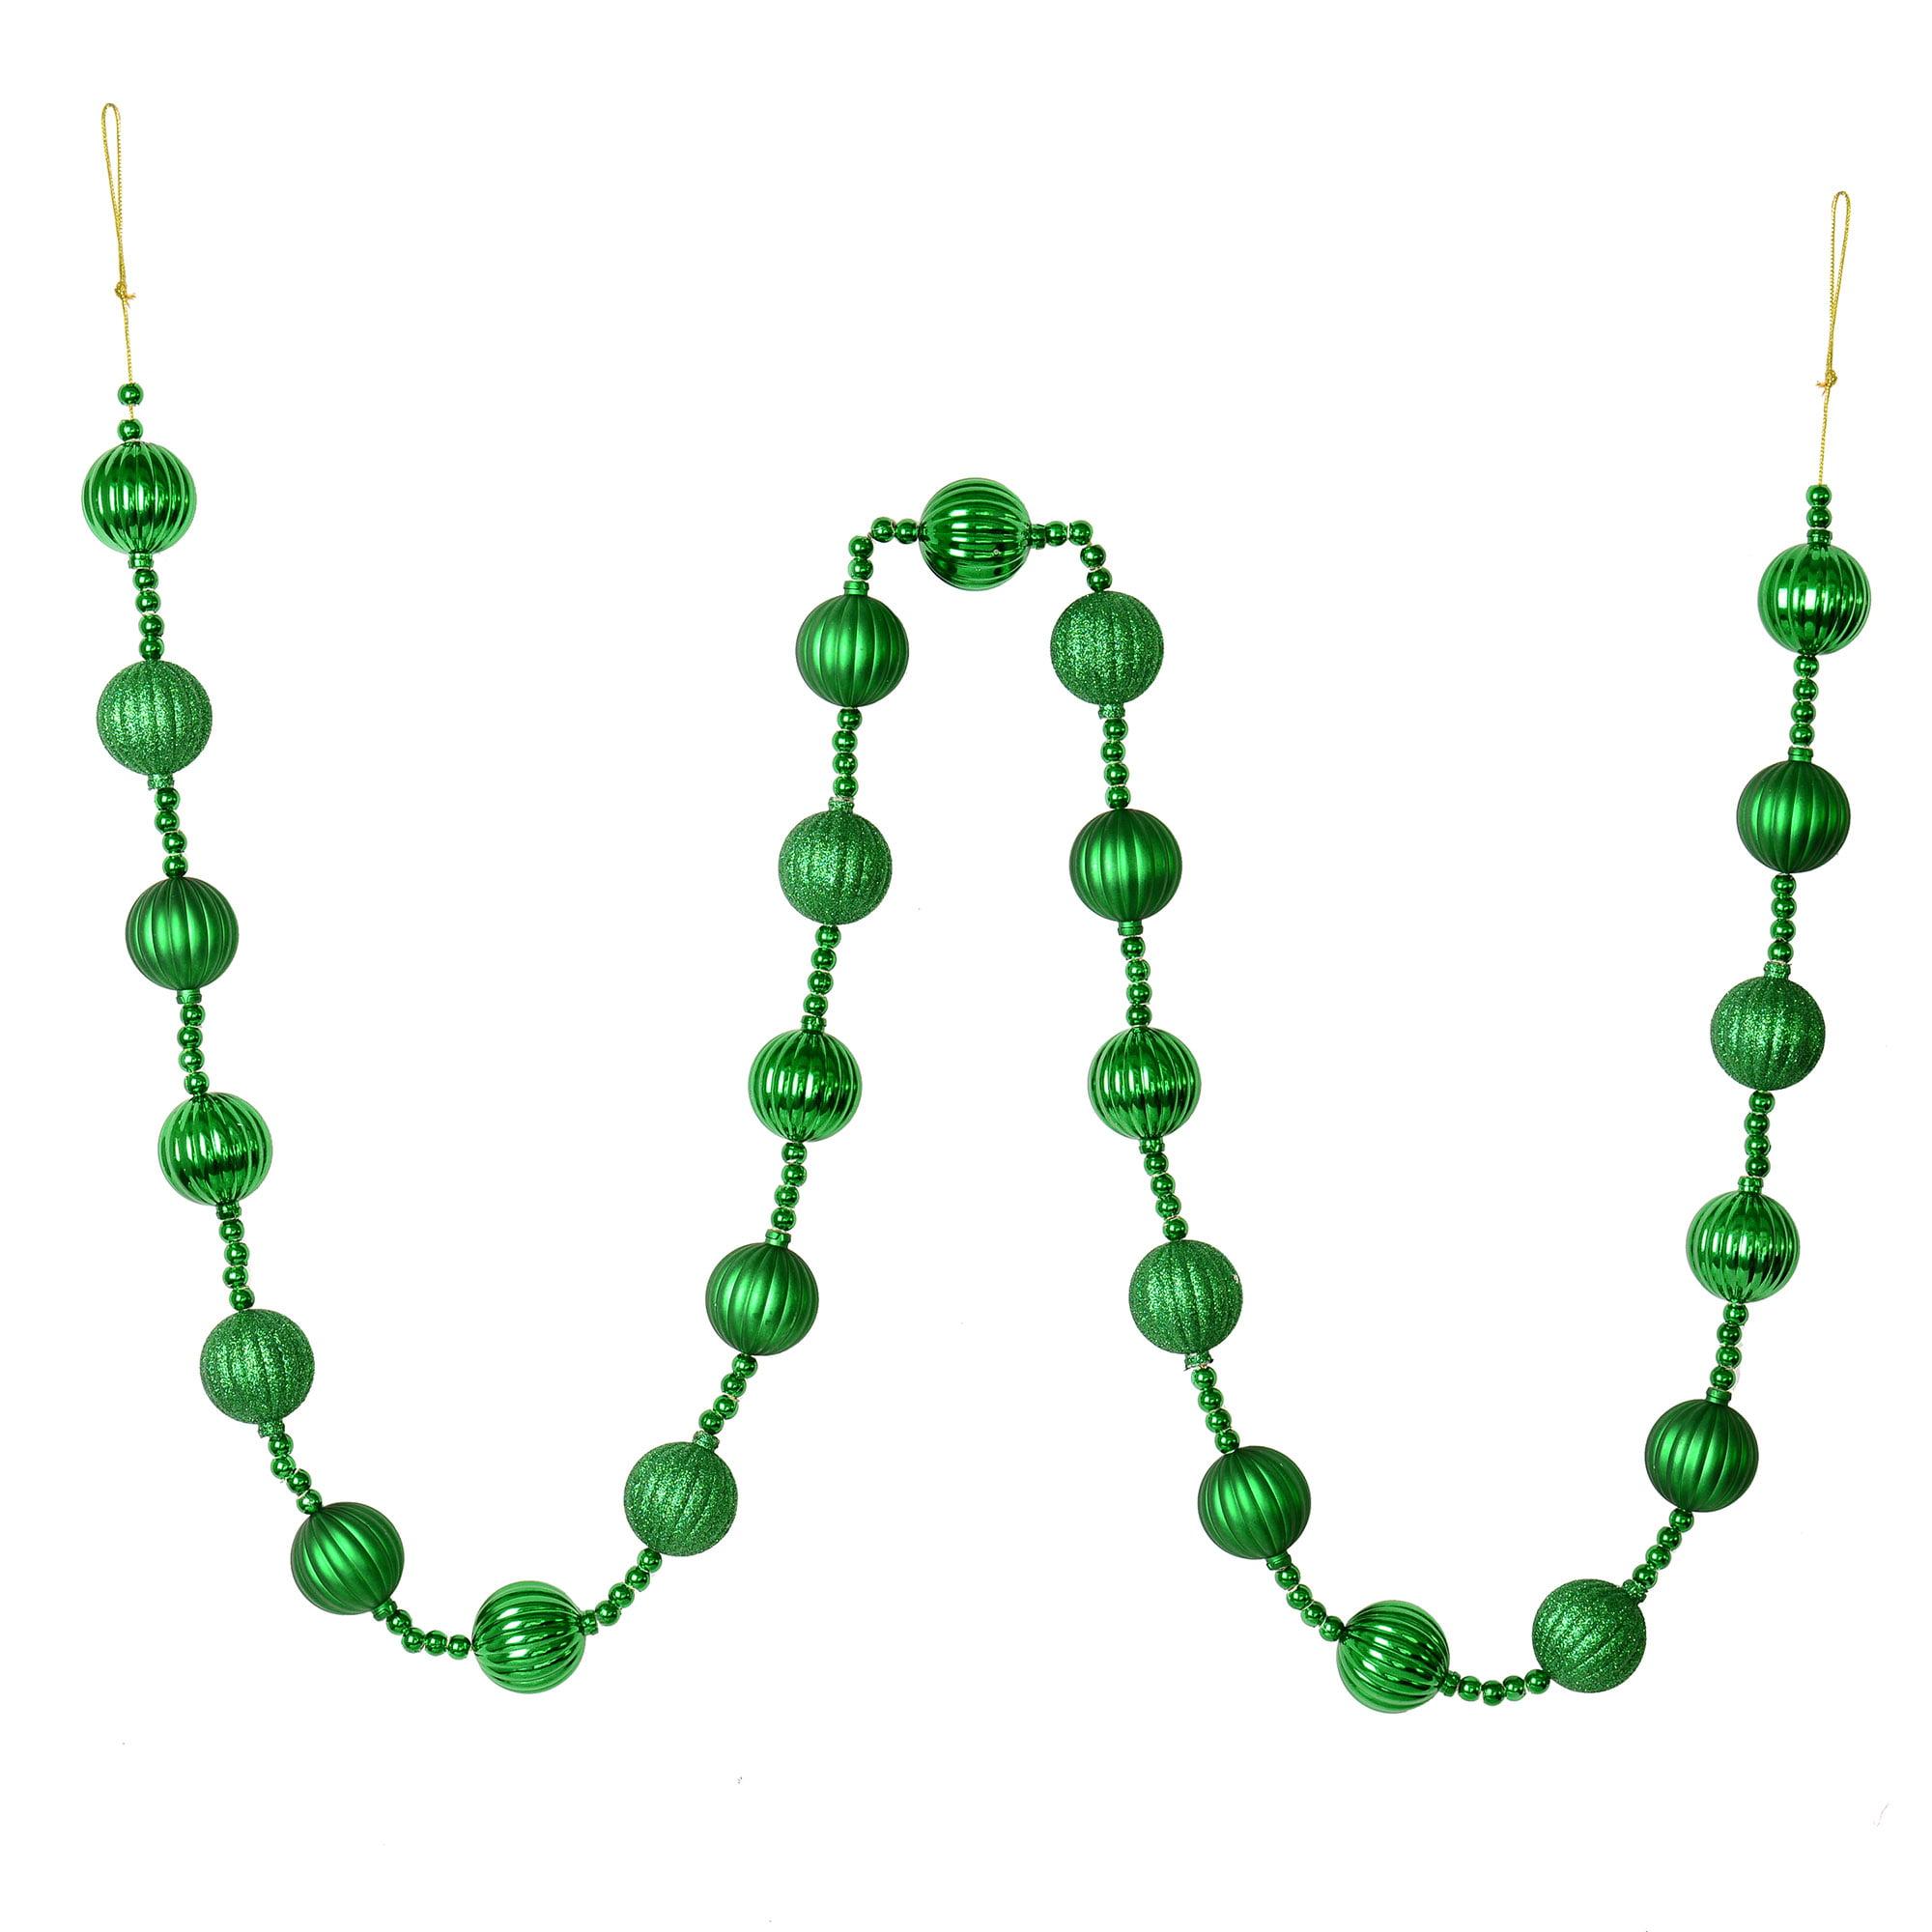 6' Emerald Stripe Ball Ornament Garland